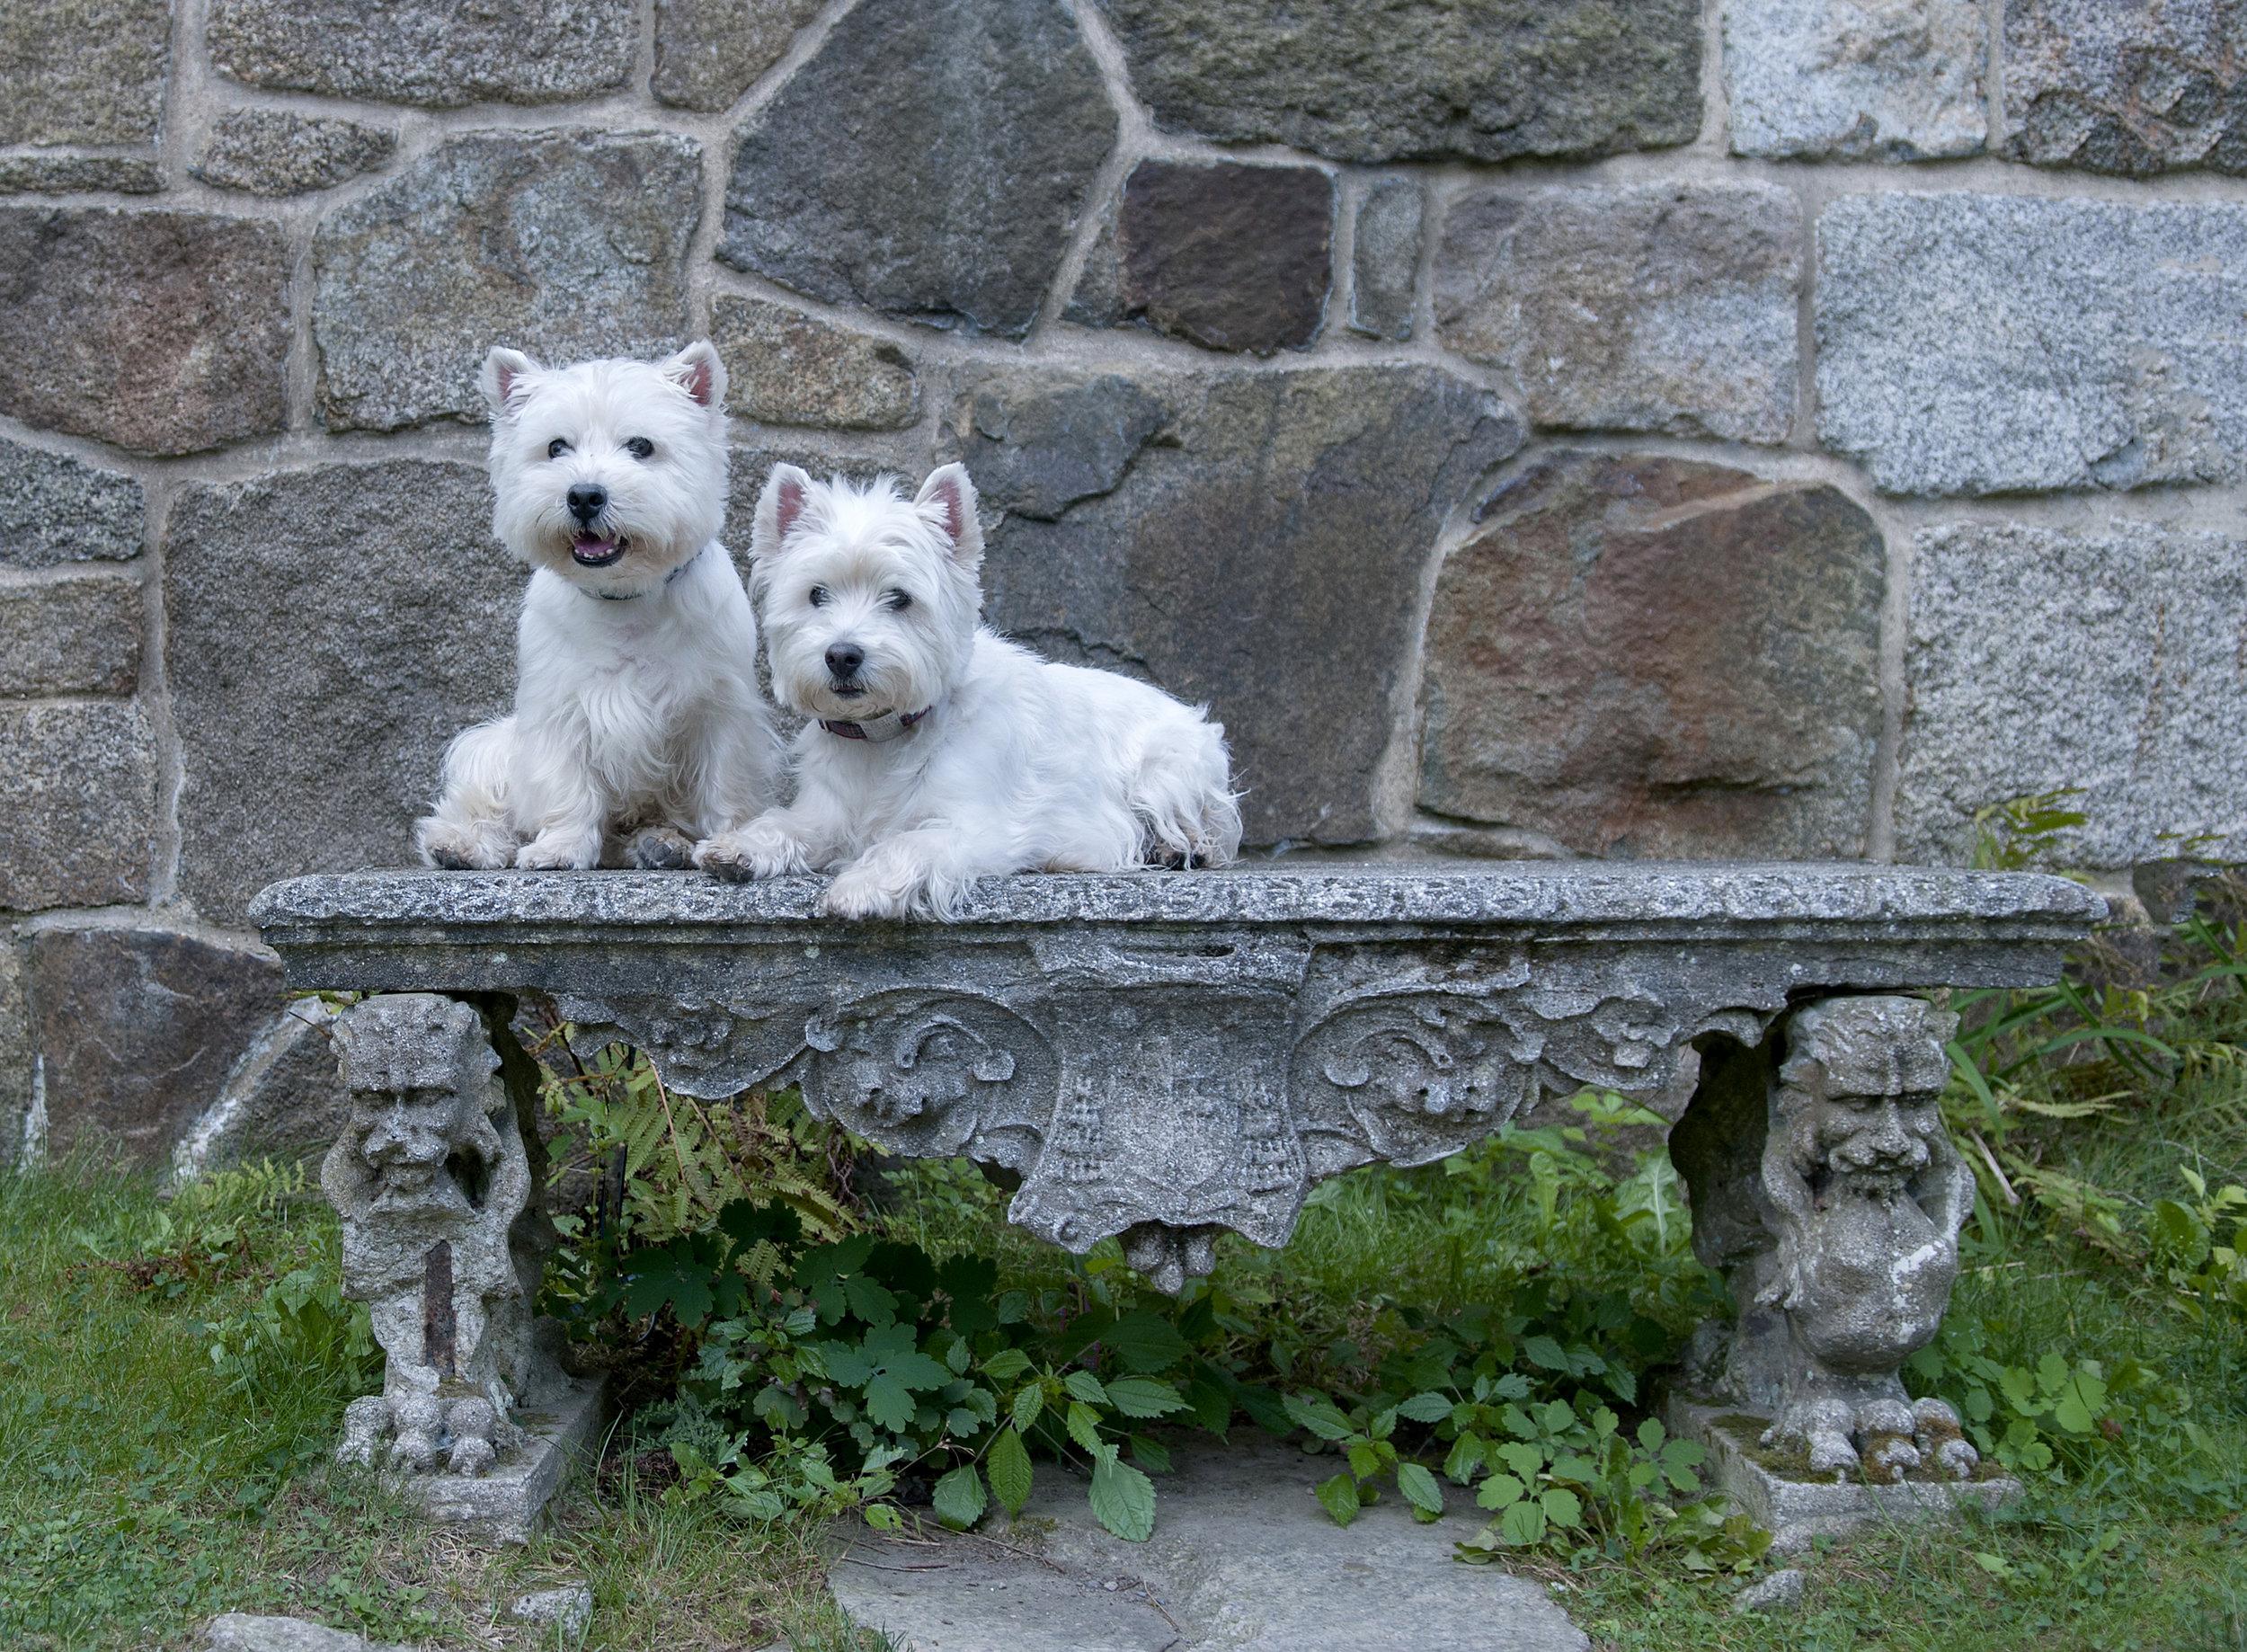 Maise & Dundee